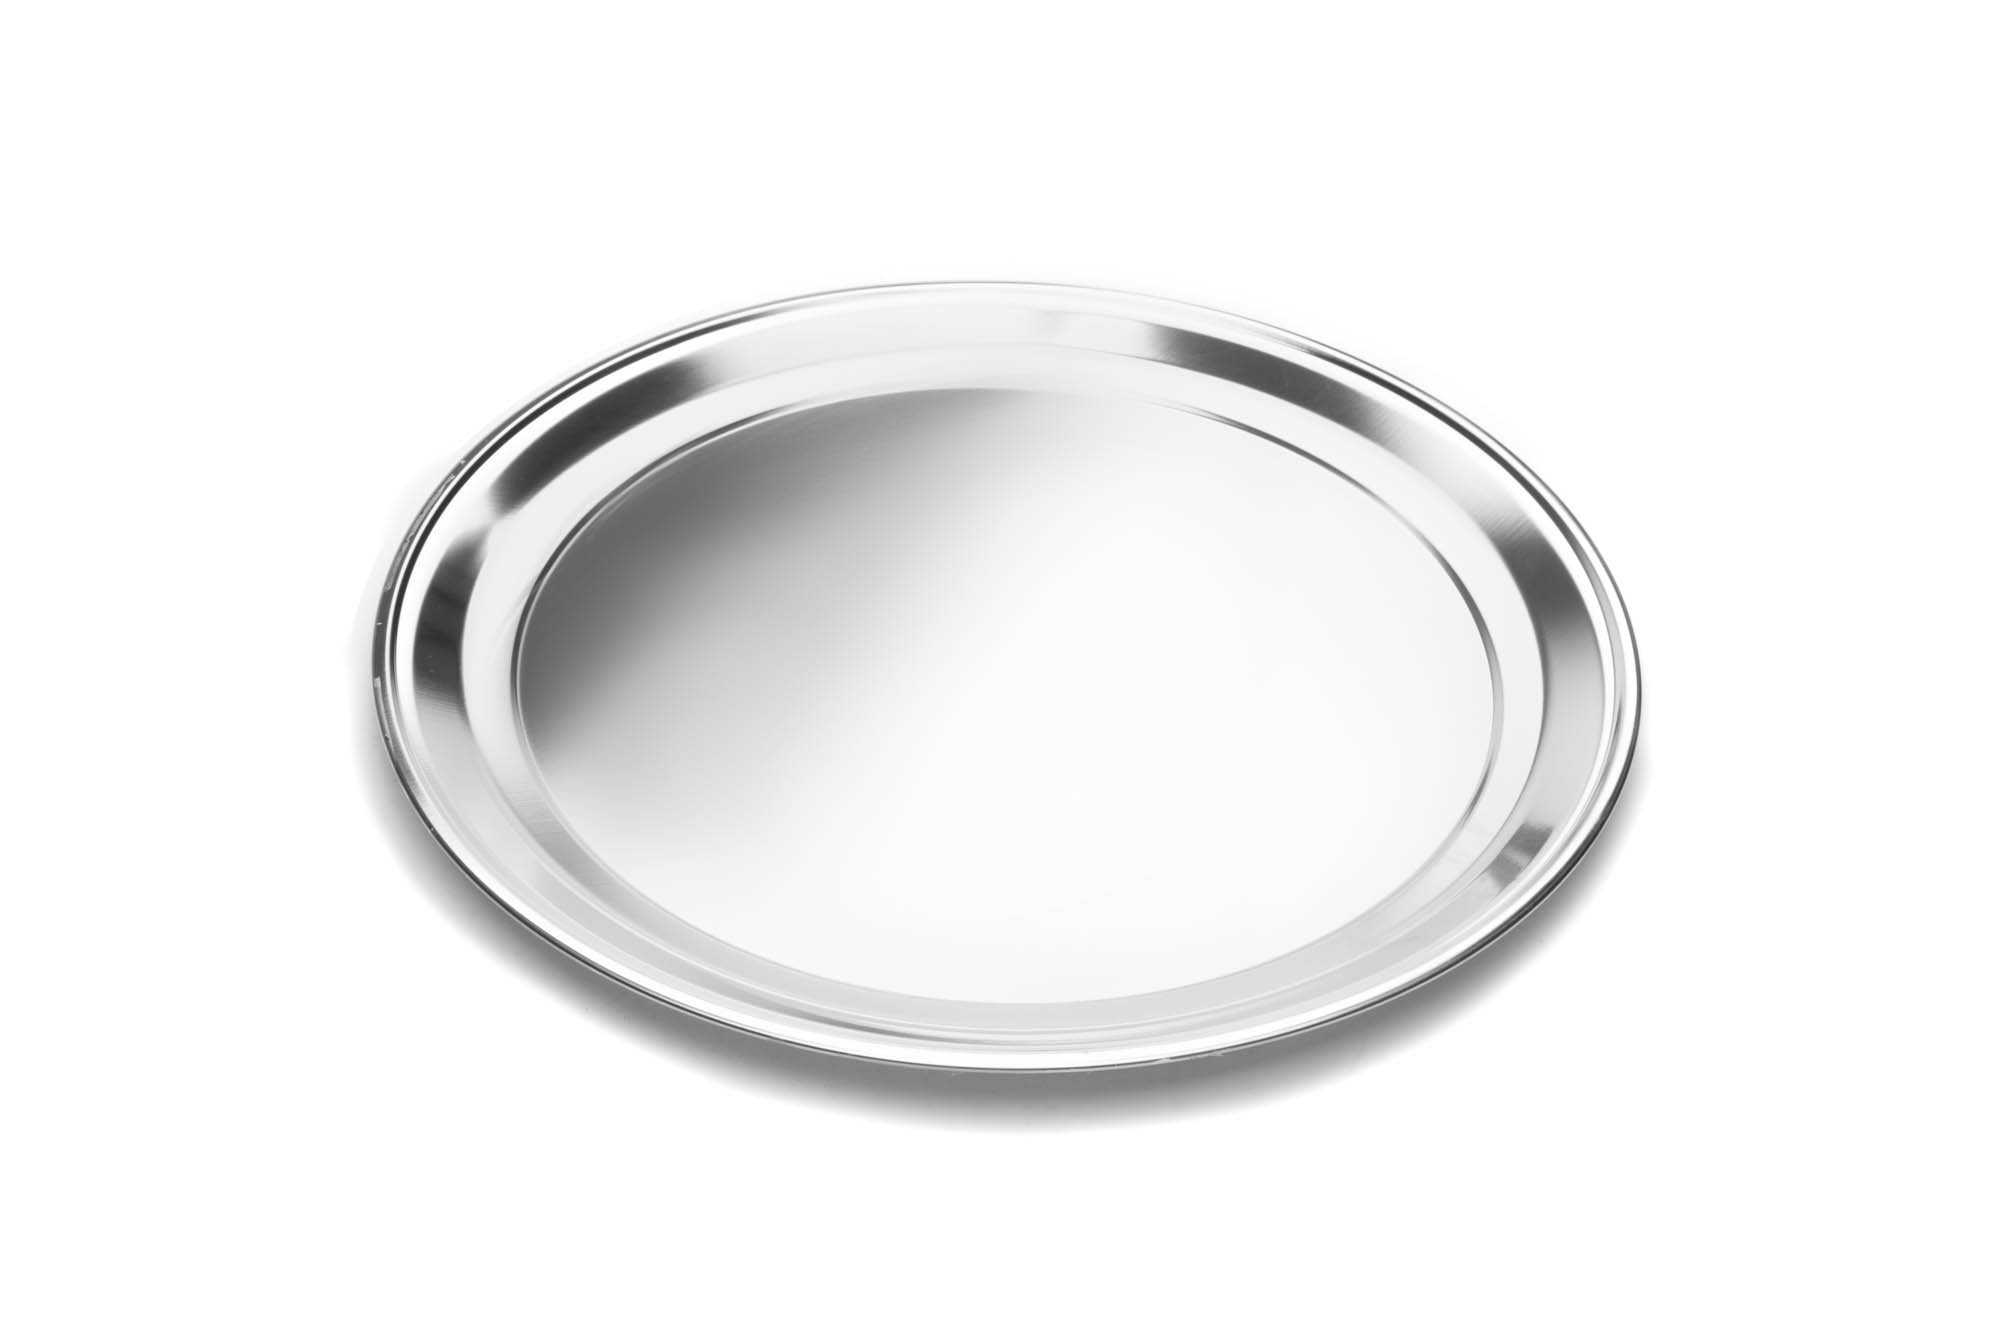 Fox Run 4497 Pizza Pan, Stainless Steel, 16-Inch by Fox Run